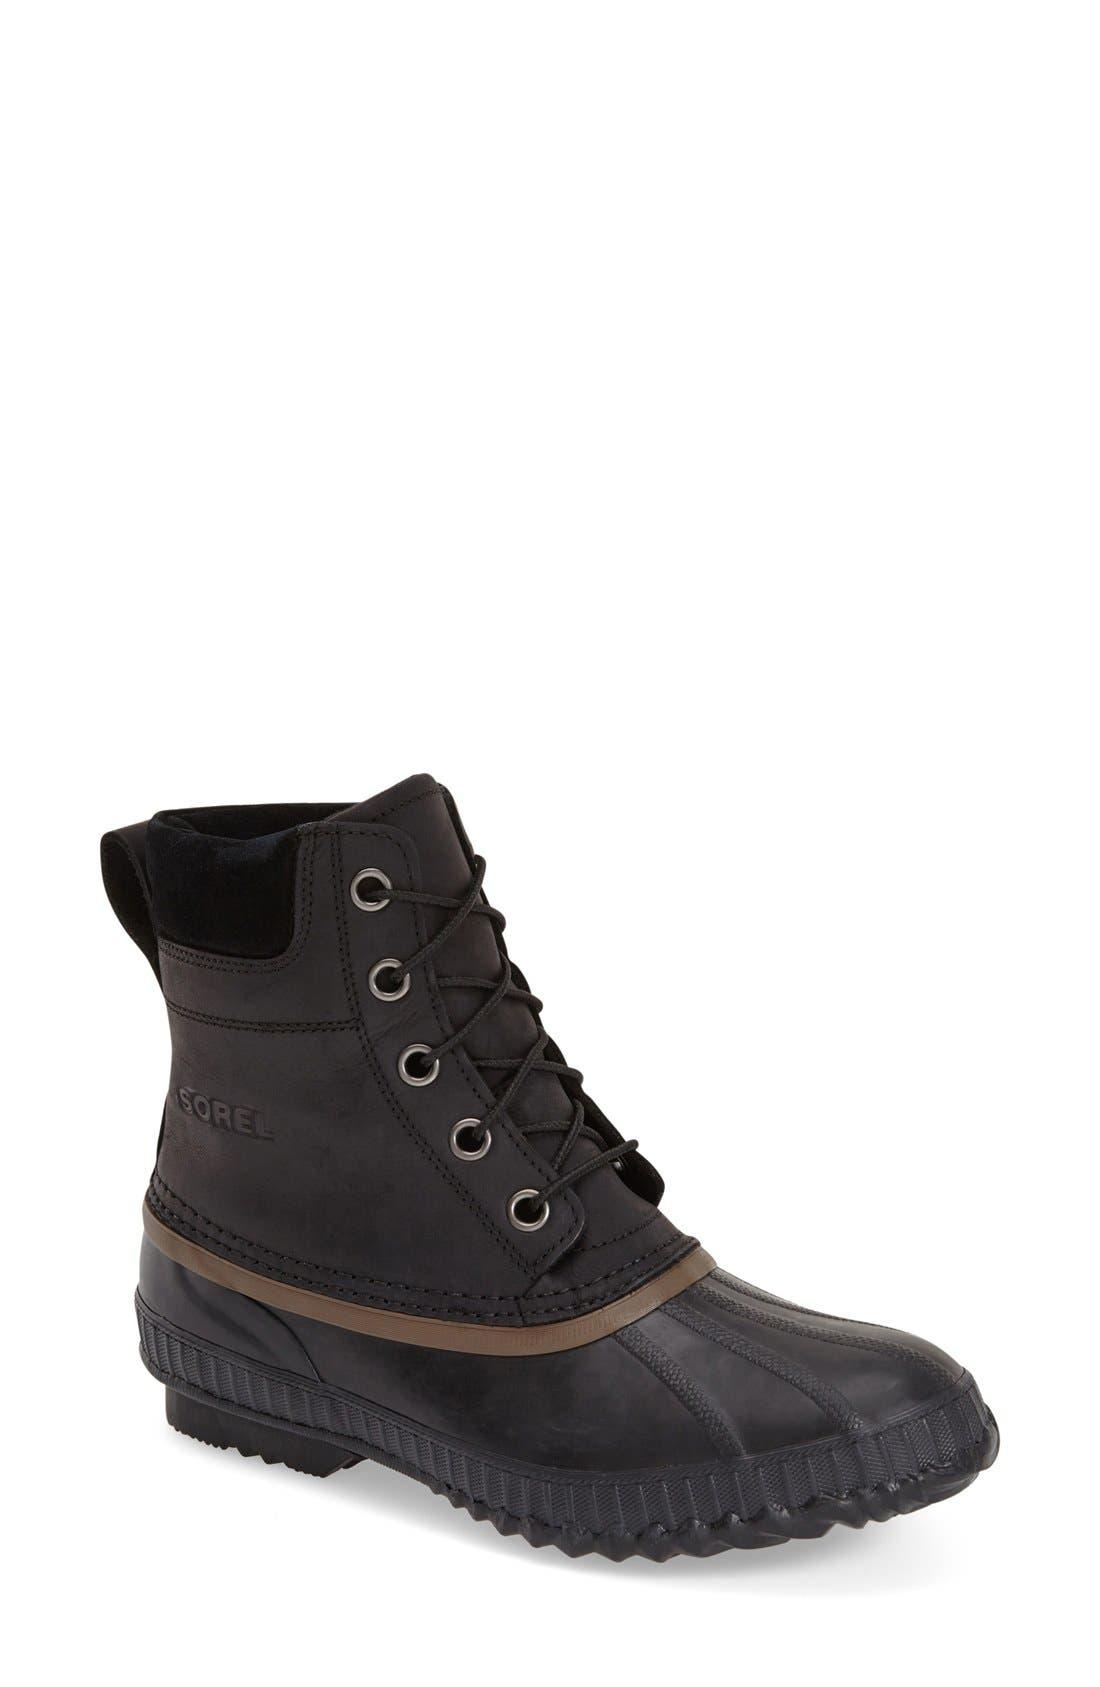 Alternate Image 1 Selected - SOREL'Cheyanne' Snow Boot